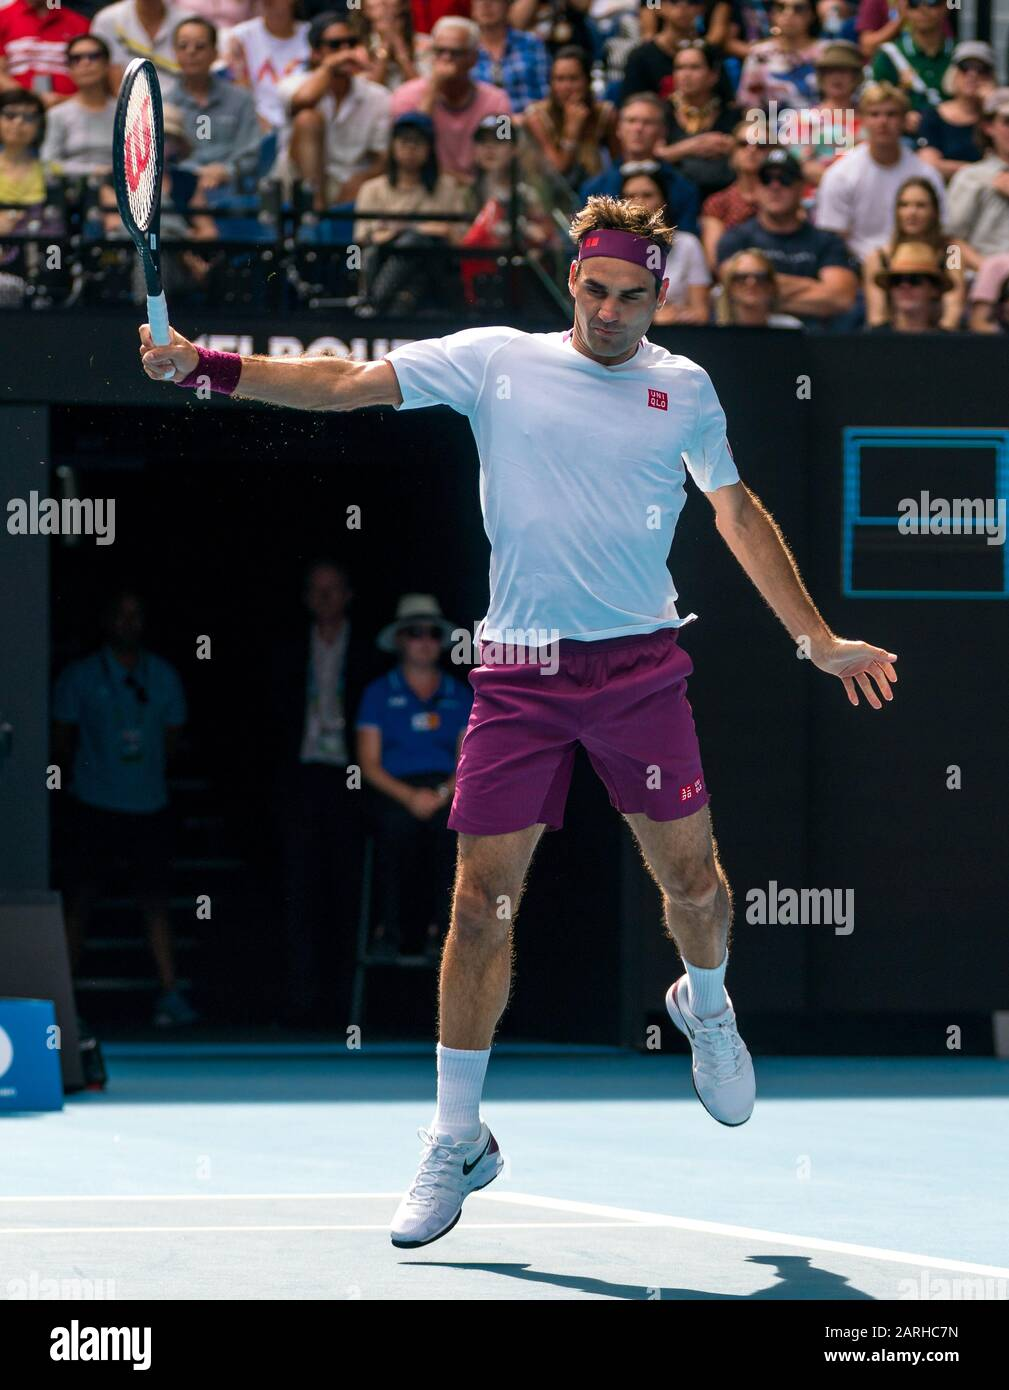 "Melbourne, Australien. Januar 2020. Roger Federer aus der Schweiz beim Match ""Australian Open Tennis Championship Day 9"" 2020 im Melbourne Park Tennis Center, Melbourne, Australien. Januar 2020. ( © Andy Cheung/ArcK Images/arckimages.com/UK Tennis Magazine/International Sports Fotos) Credit: Roger Parker/Alamy Live News Stockfoto"